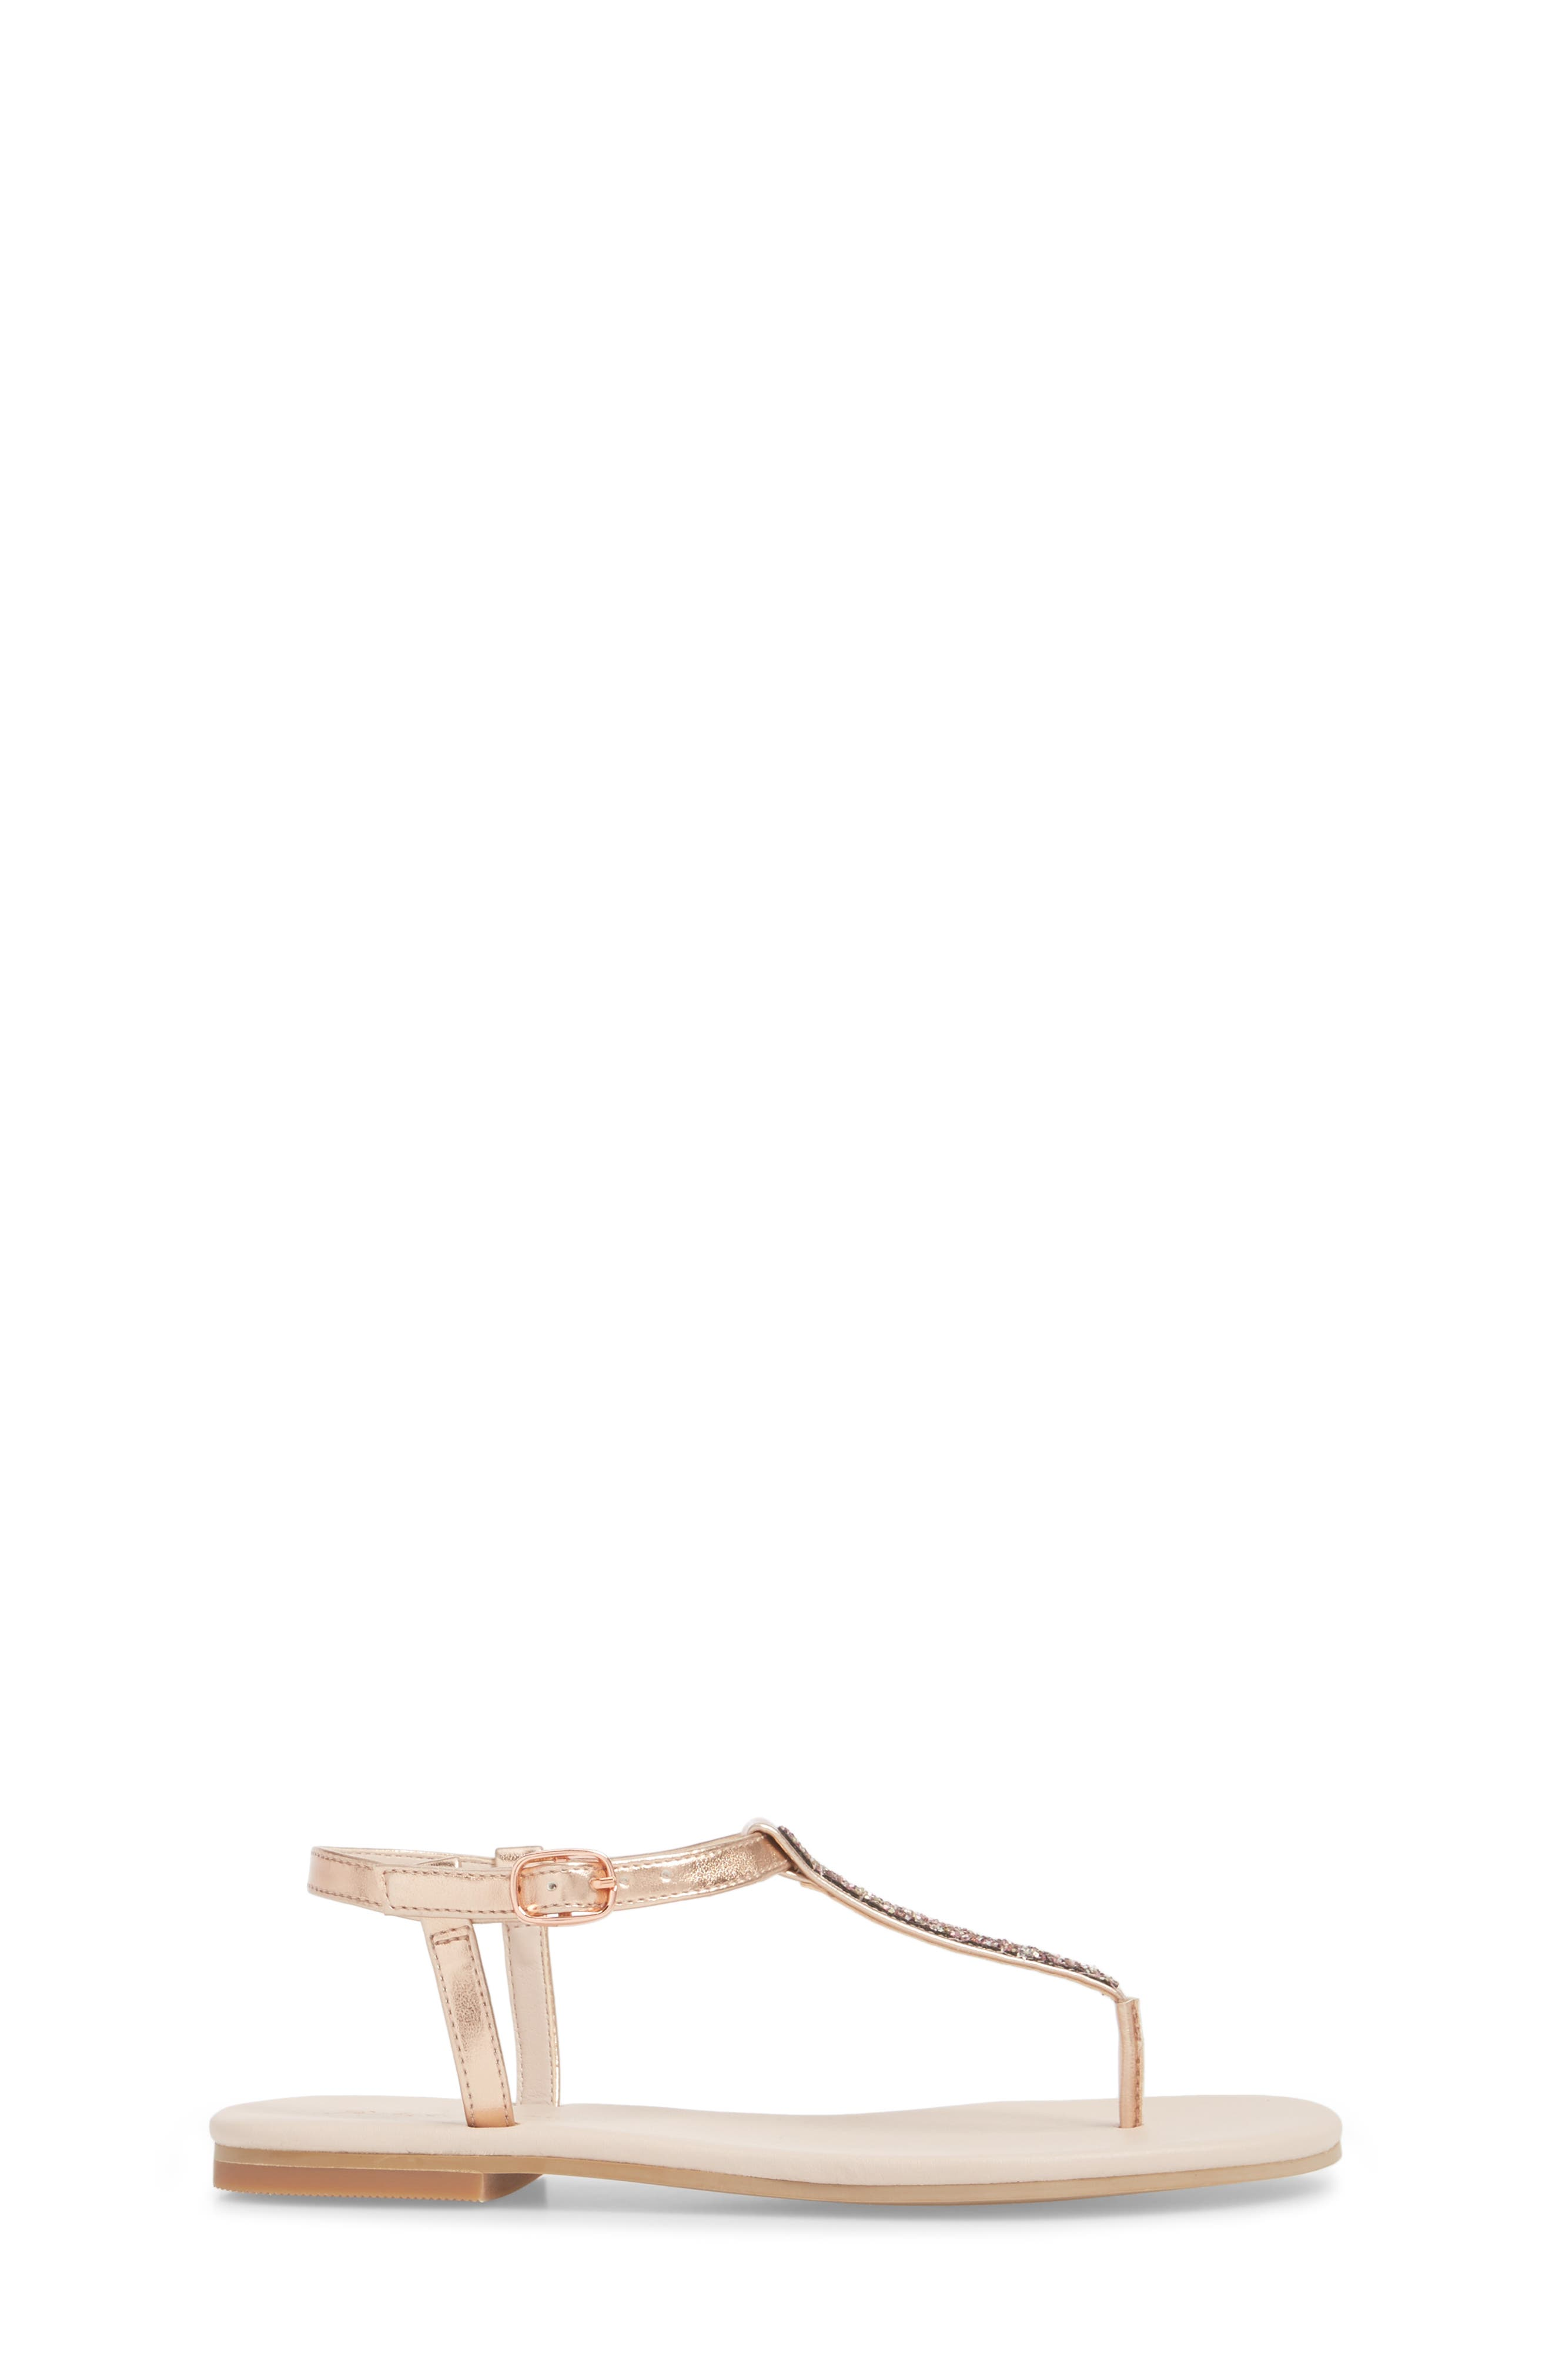 Noe Glitter T-Strap Sandal Sandal,                             Alternate thumbnail 3, color,                             ROSE GOLD FAUX LEA